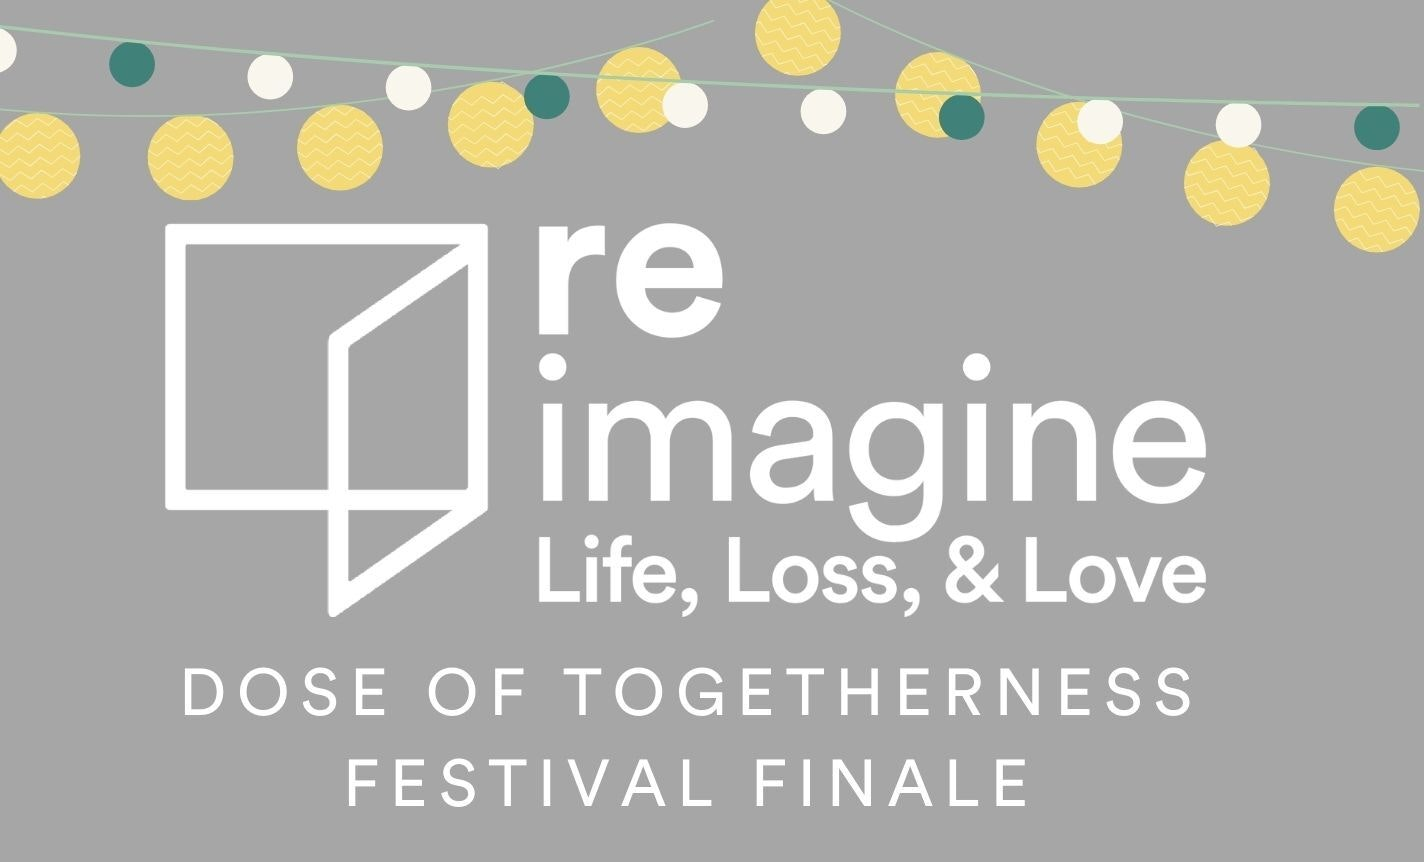 Dose of Togetherness Festival Finale